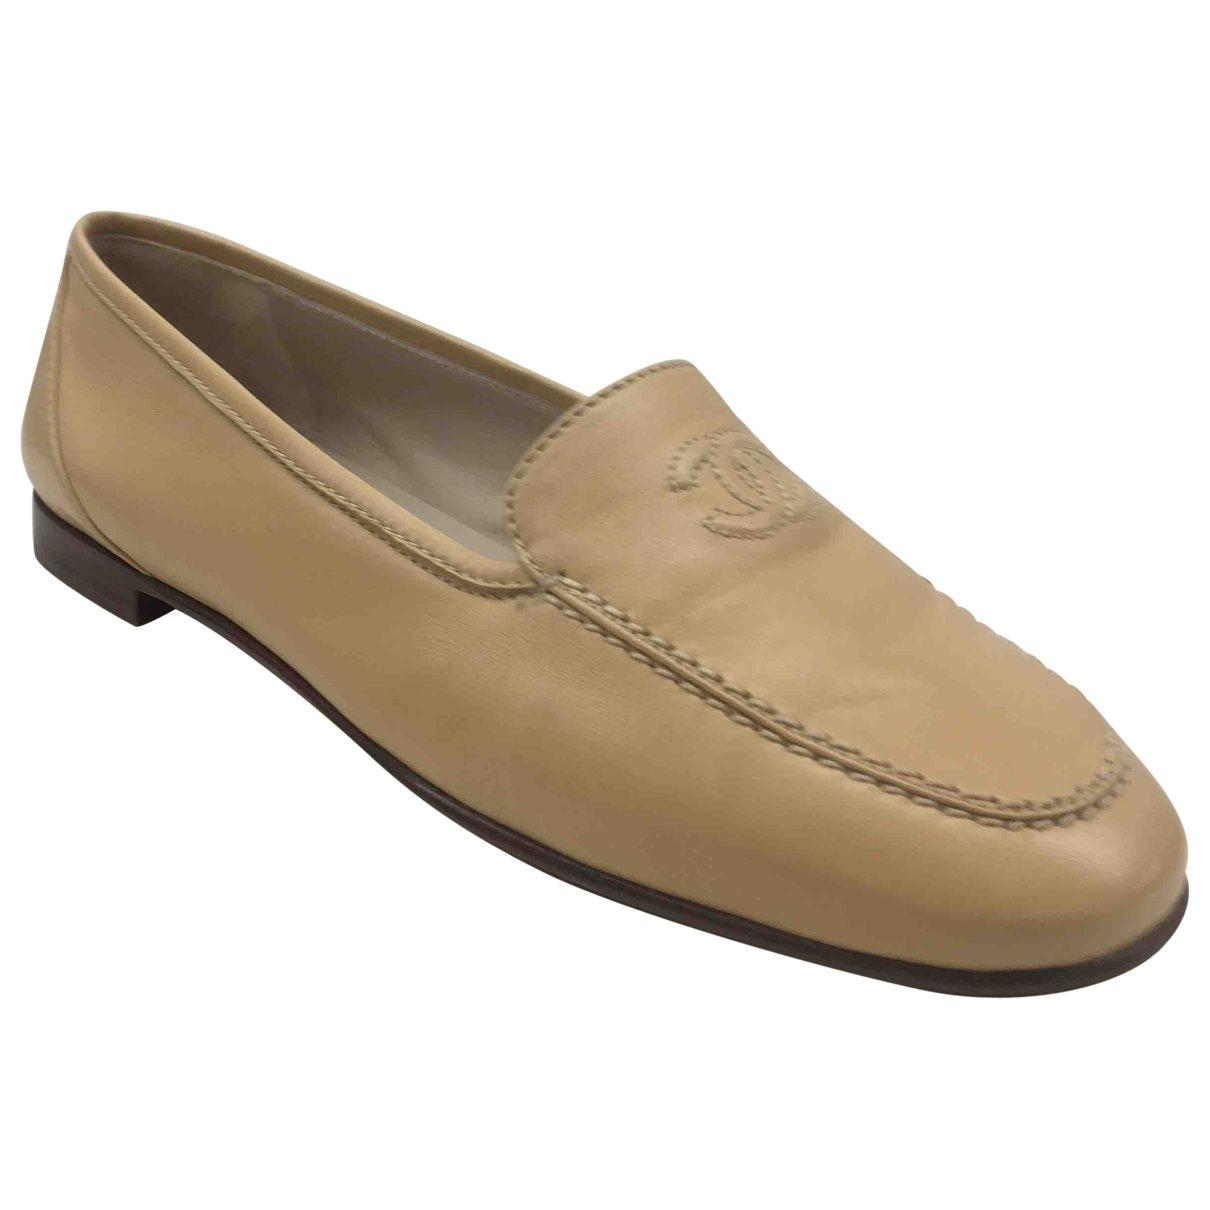 Chanel \N Beige Leather Flats for Women 38.5 EU